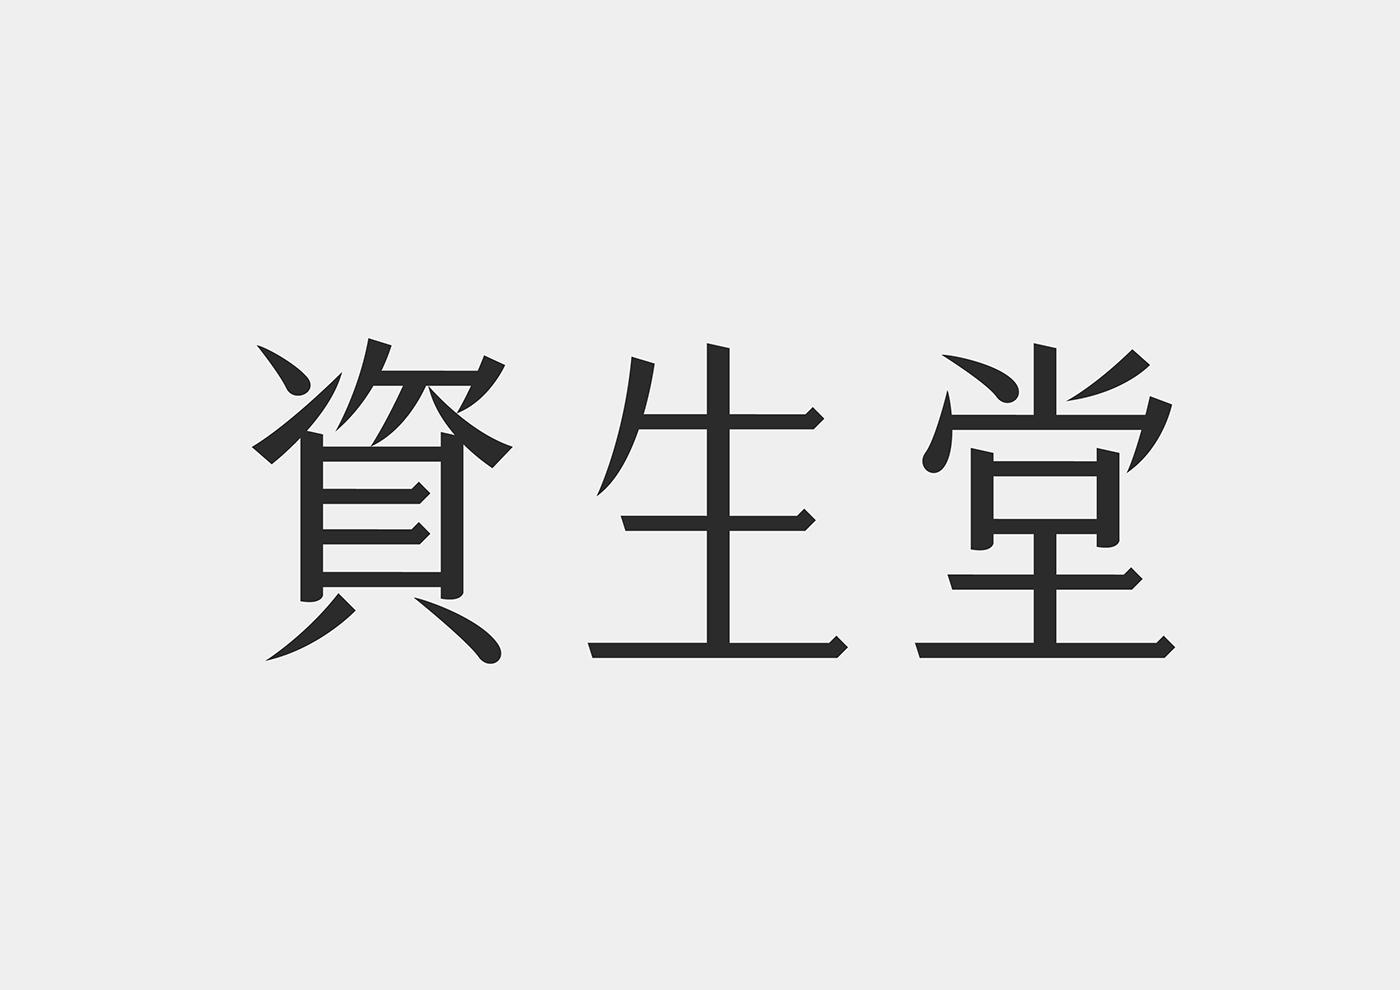 SHISEIDO Font Practice 資生堂書體仿作 on Behance